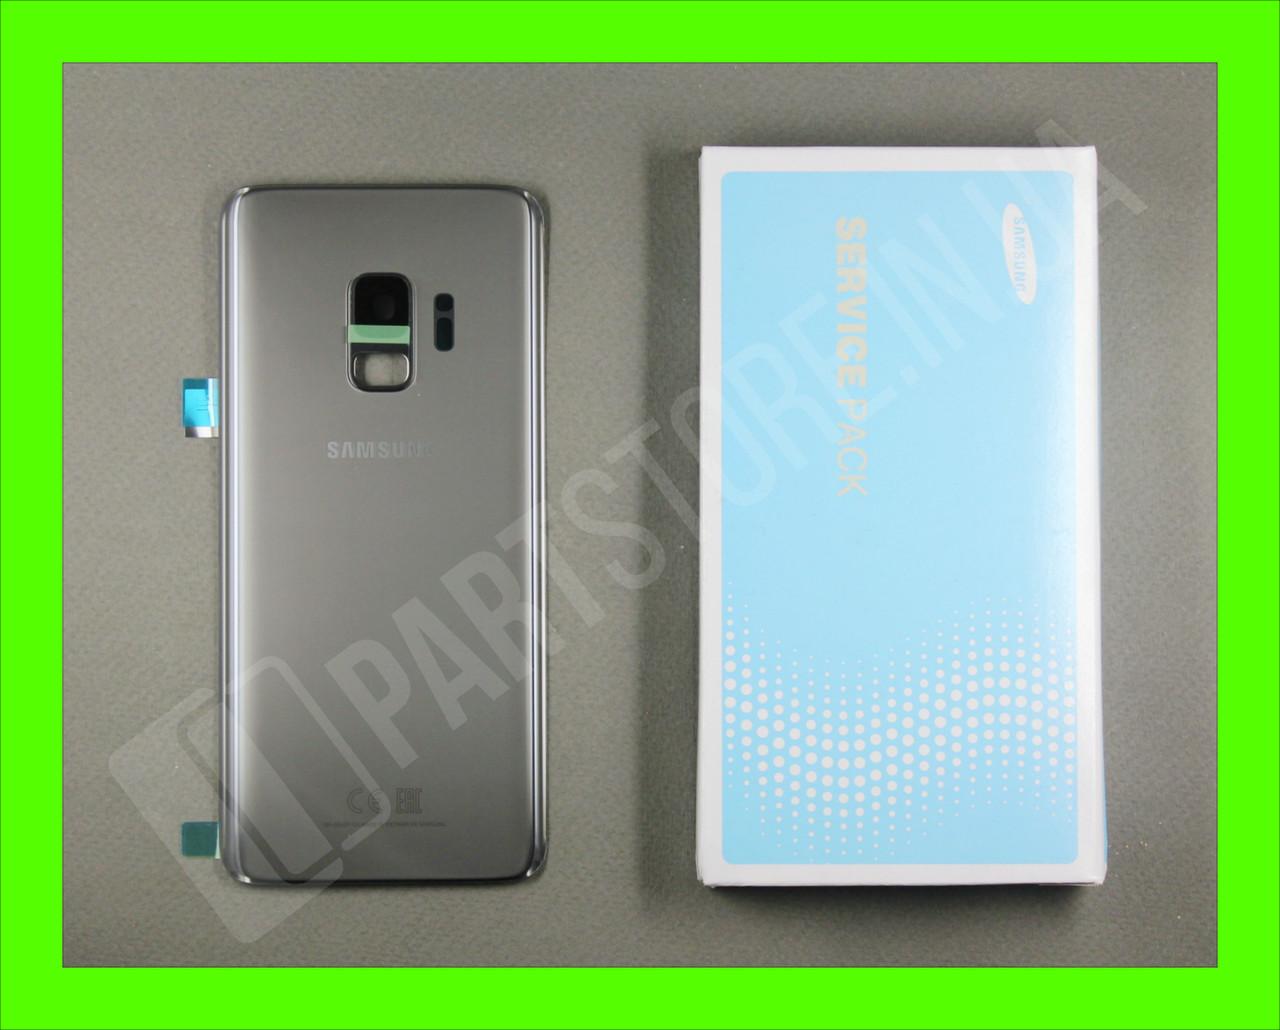 Cервисная оригинальная задняя Крышка Samsung G960 Grey S9 (GH82-15926C)